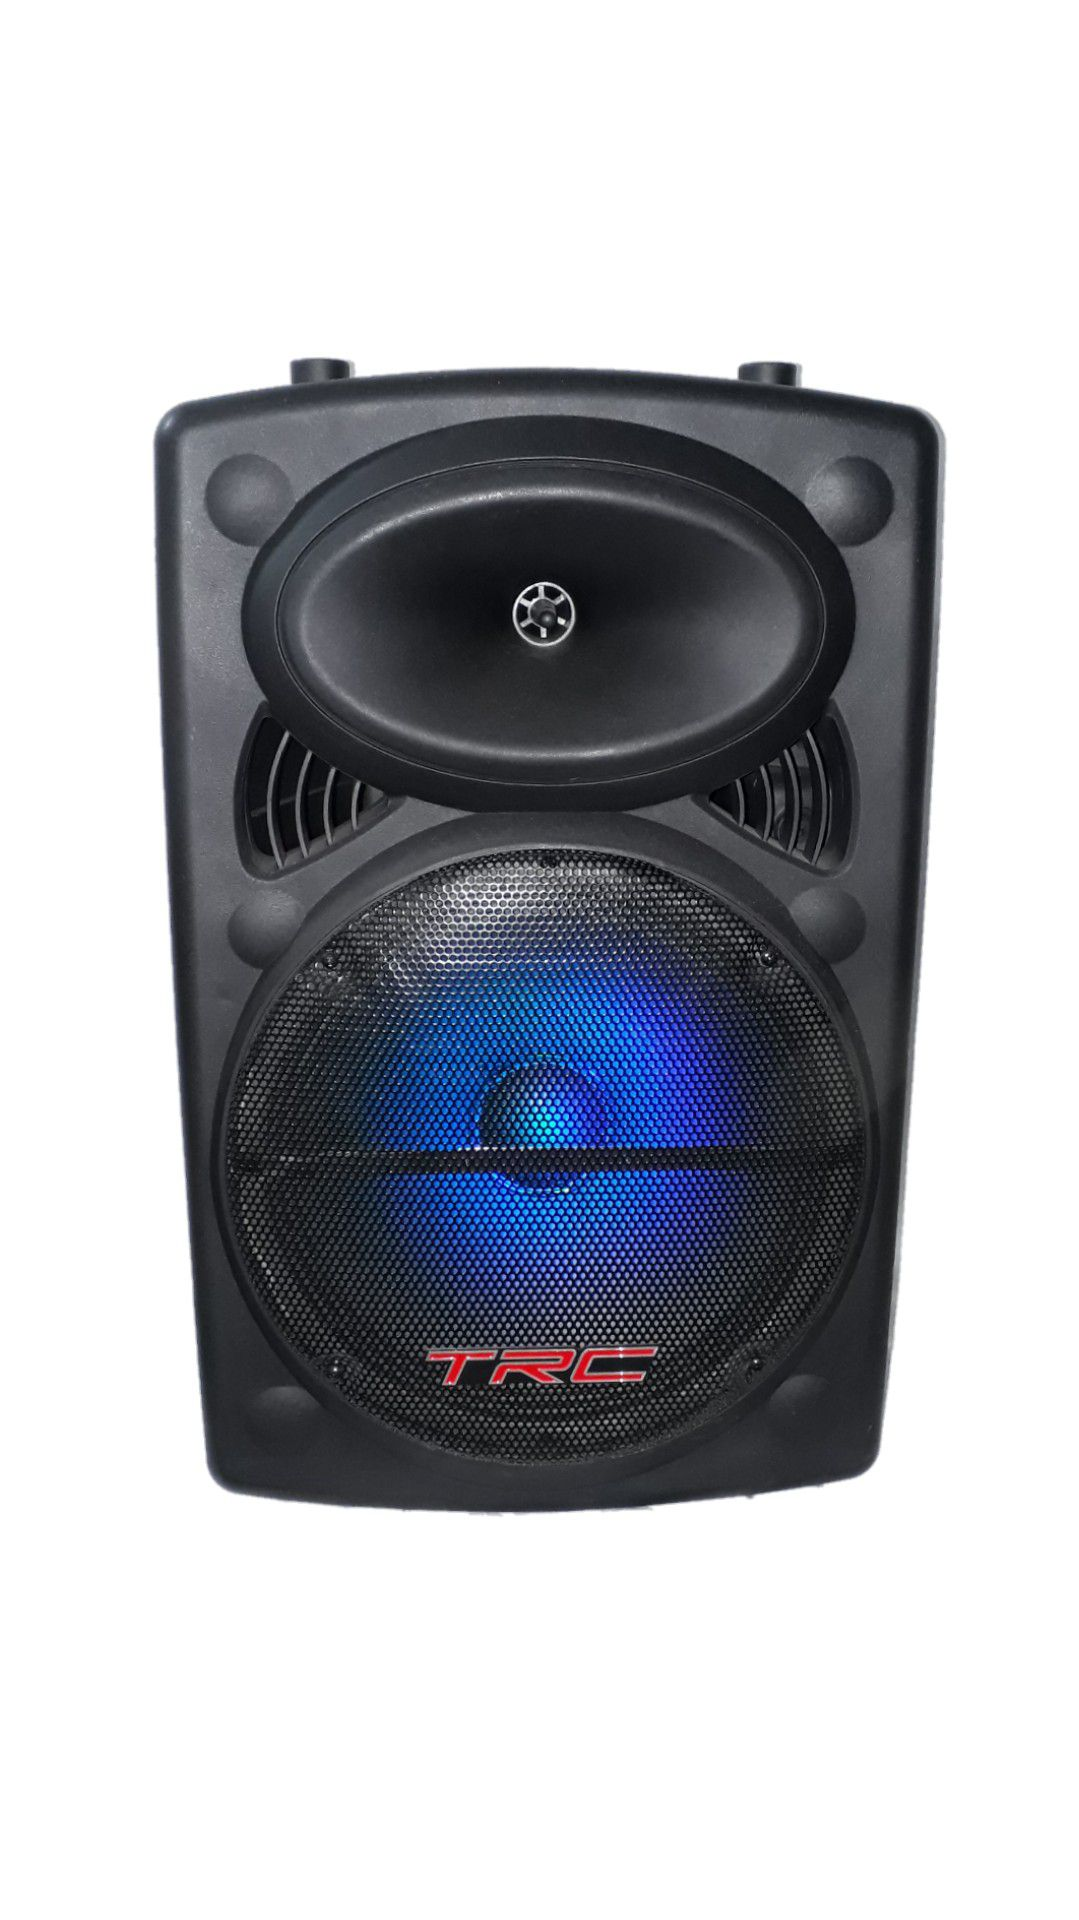 Caixa Amplificada Trc 436 Blue.usb/sd/fm,1mic.fal12 Bat12v Roda Ativa 35